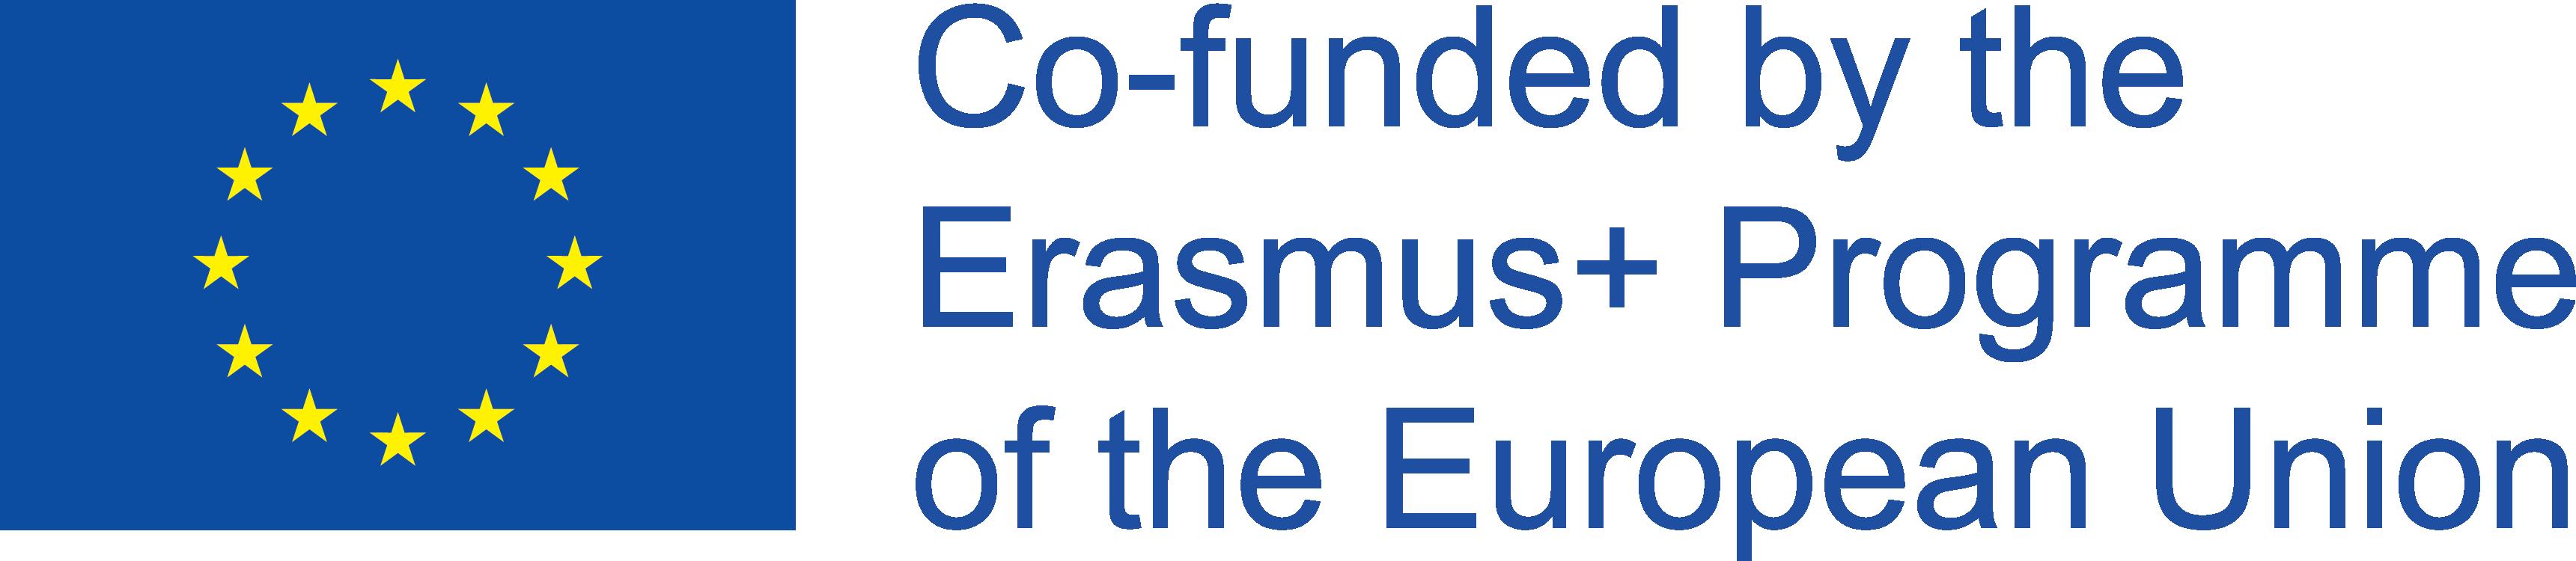 erasmus+ van de europese unie